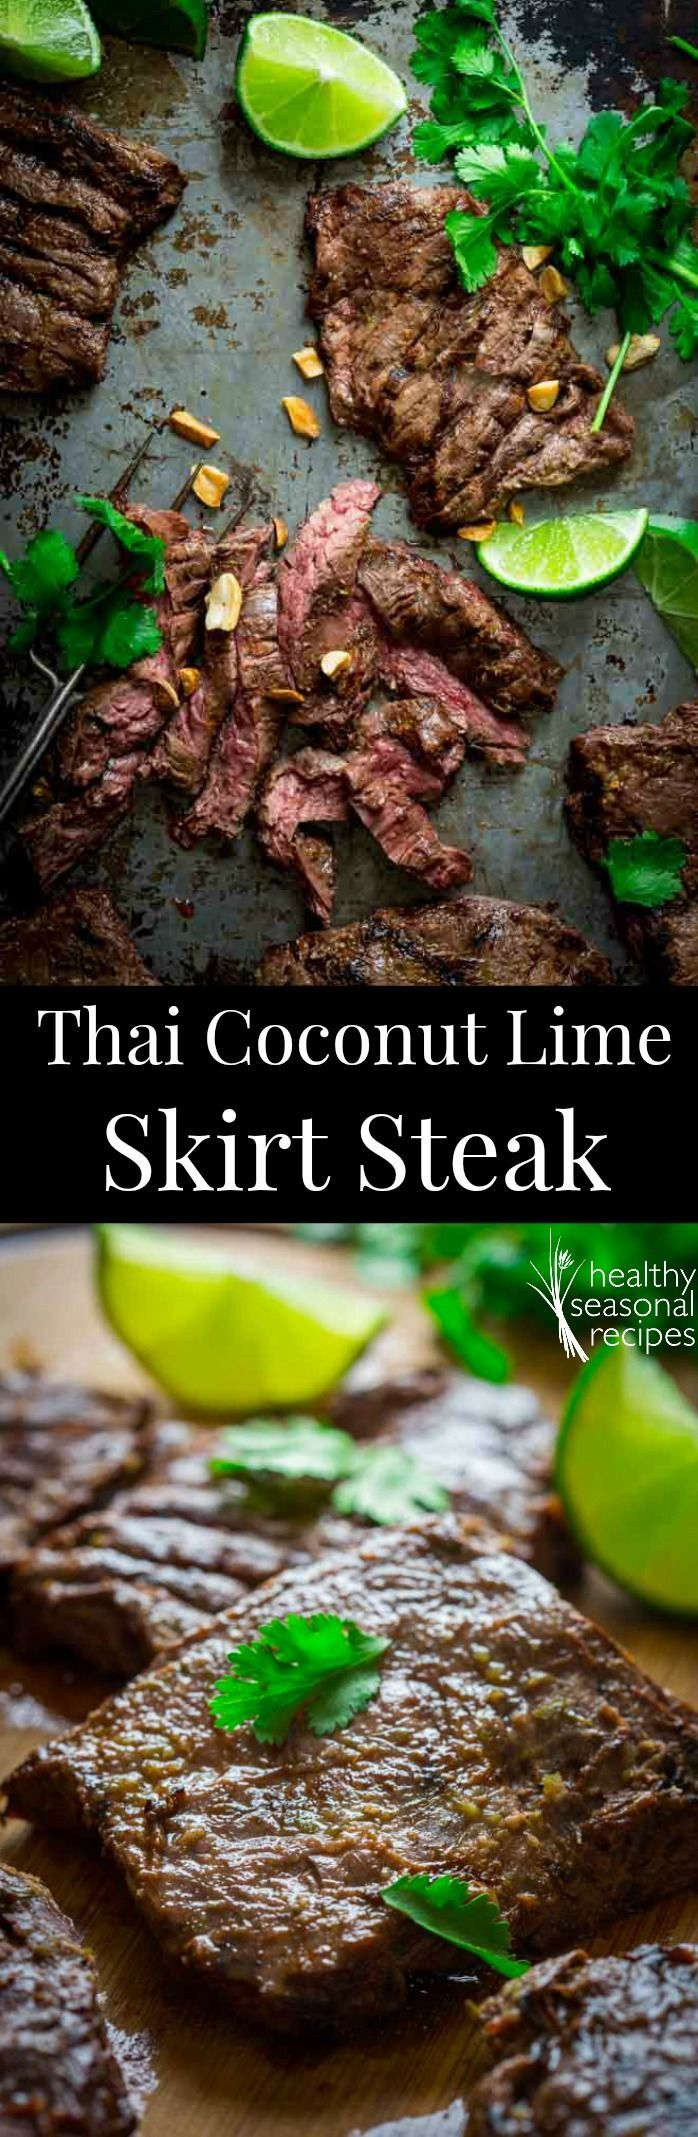 grilled thai coconut lime skirt steak - Healthy Seasonal Recipes